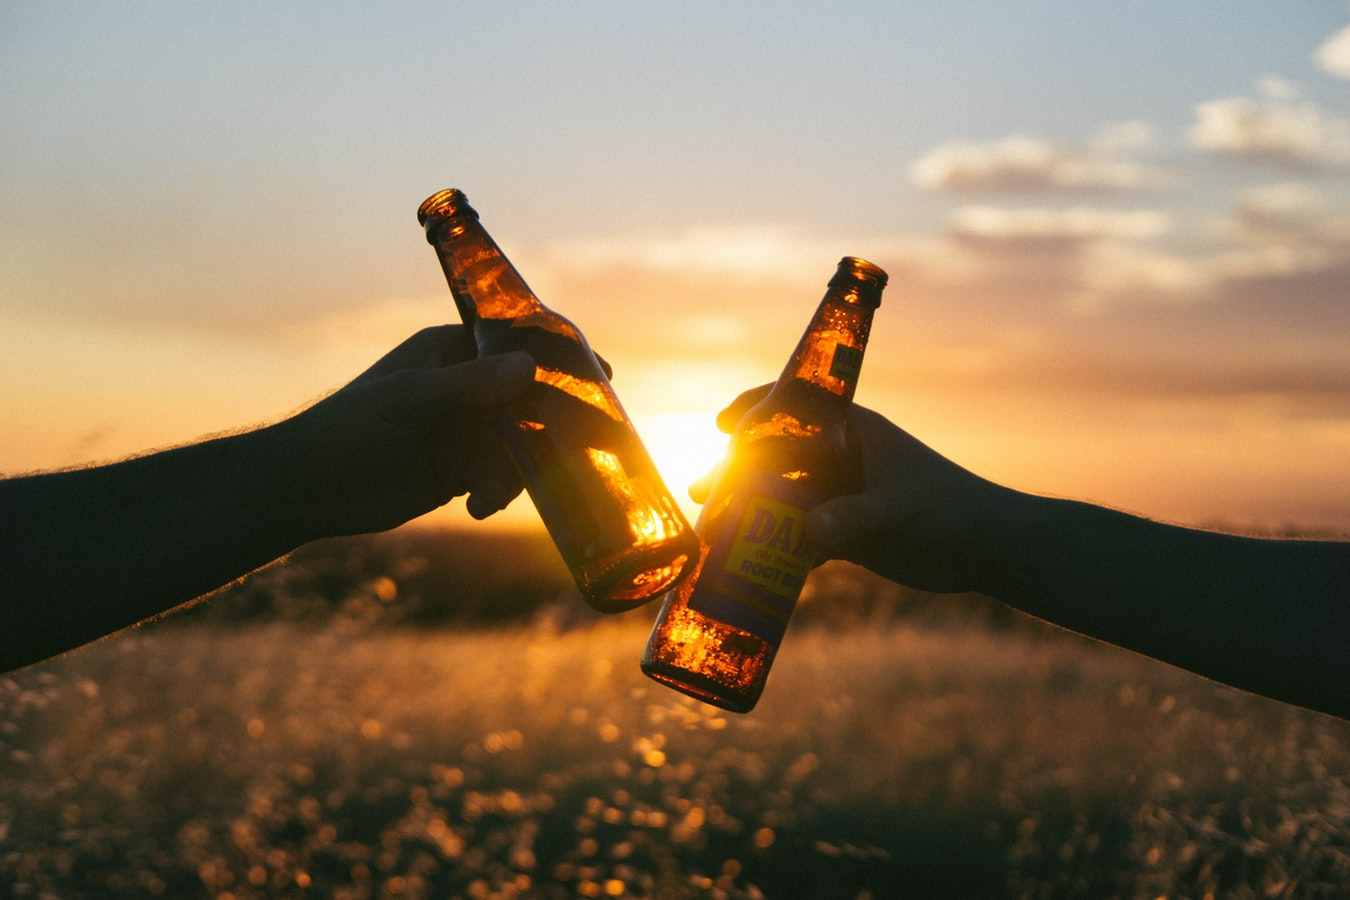 bar-a-bieres-marche-de-noel-rouen.jpg